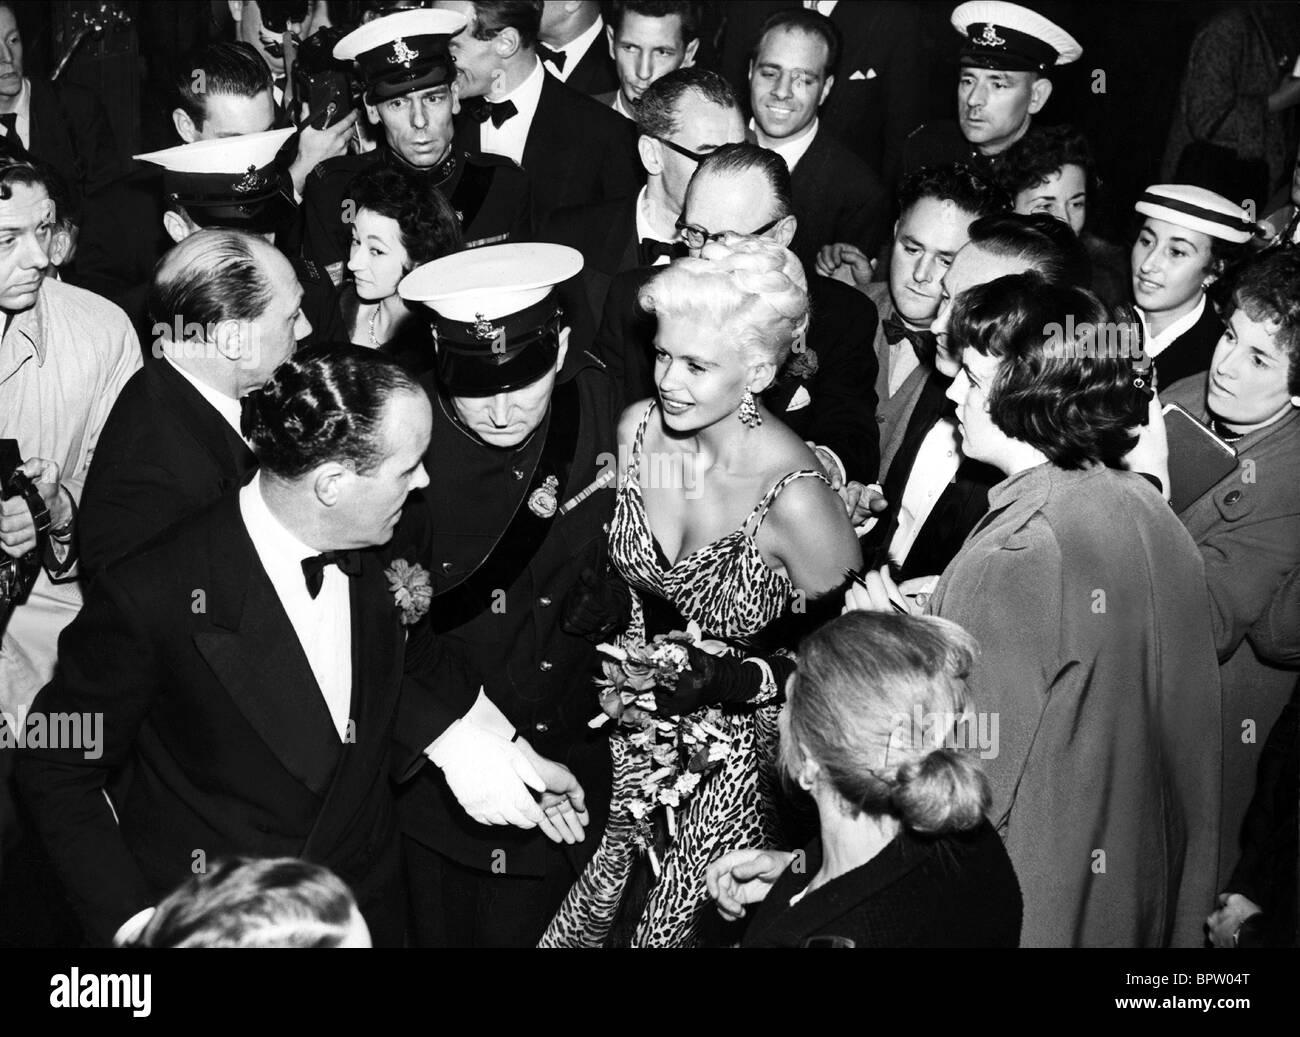 JAYNE MANSFIELD WILL SUCCESS SPOIL ROCK HUNTER PREMIERE (1957) - Stock Image